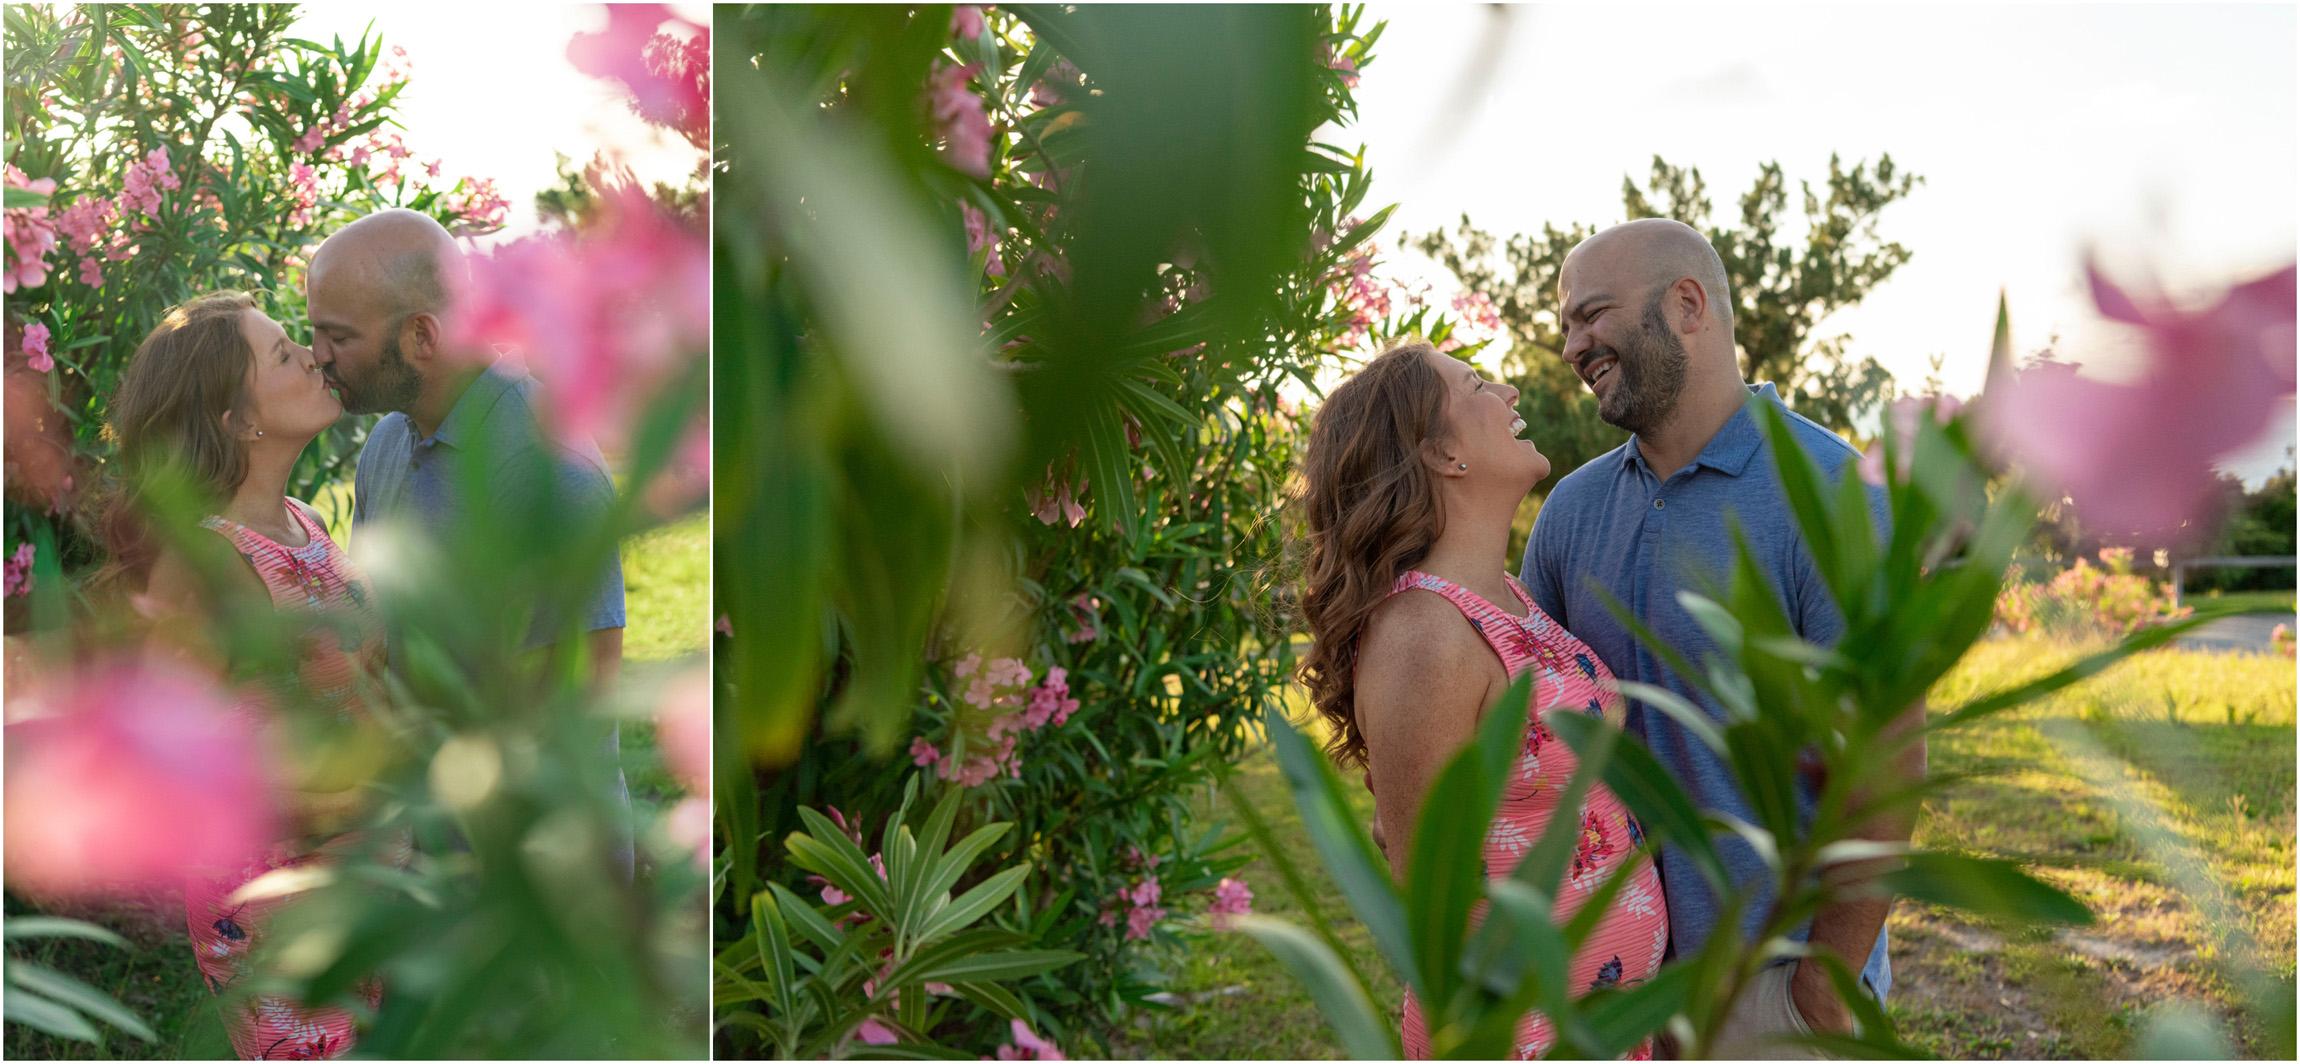 ©FianderFoto_Bermuda Maternity Photographer_Elys Harbour_Ft Scaur_Airbnb_Victoria_Mike_019.jpg